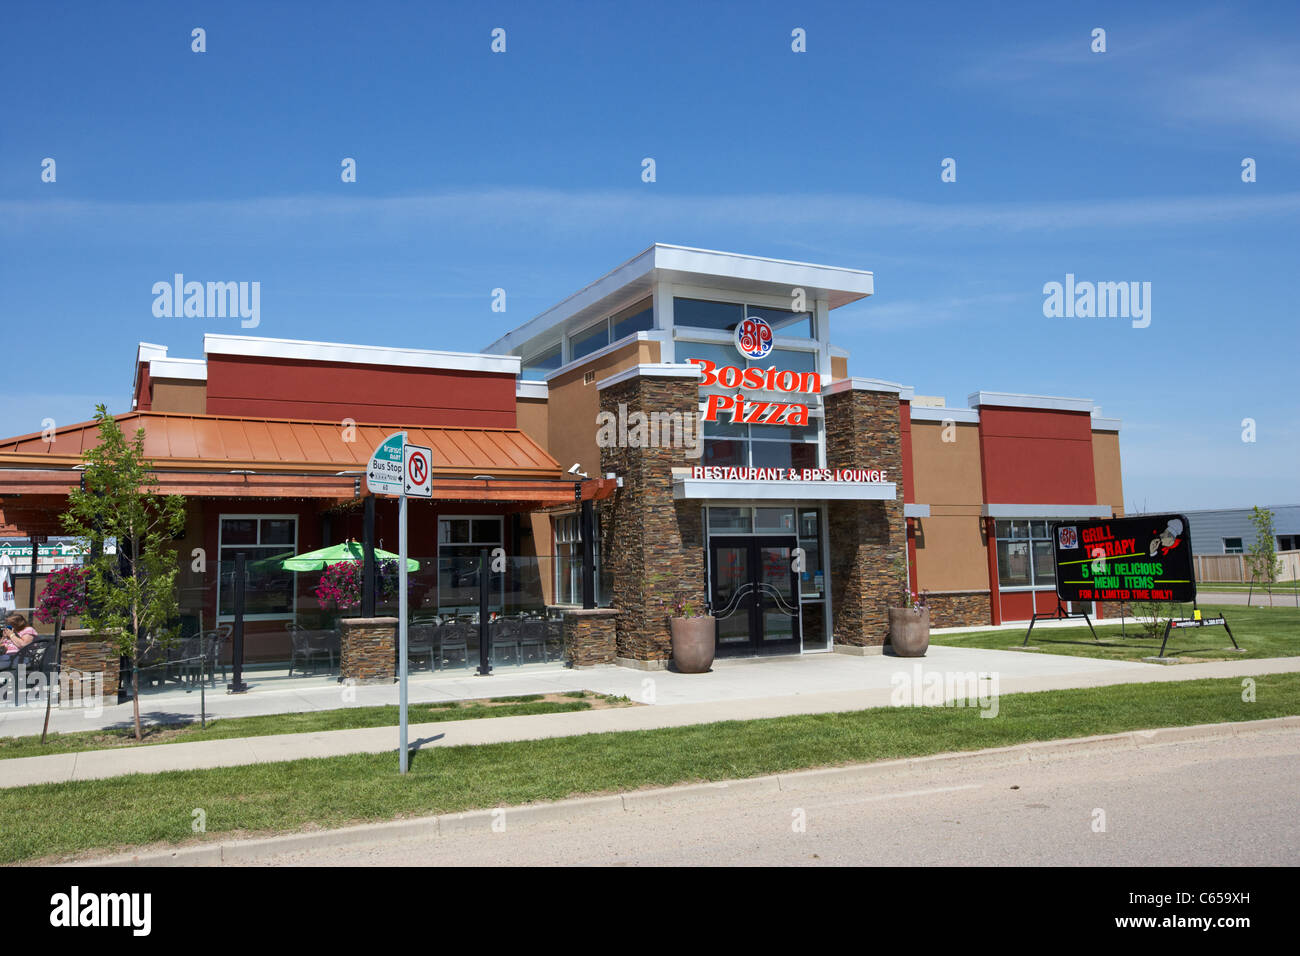 Boston Pizza cadena de restaurantes canadiense Saskatoon Saskatchewan Canadá Imagen De Stock